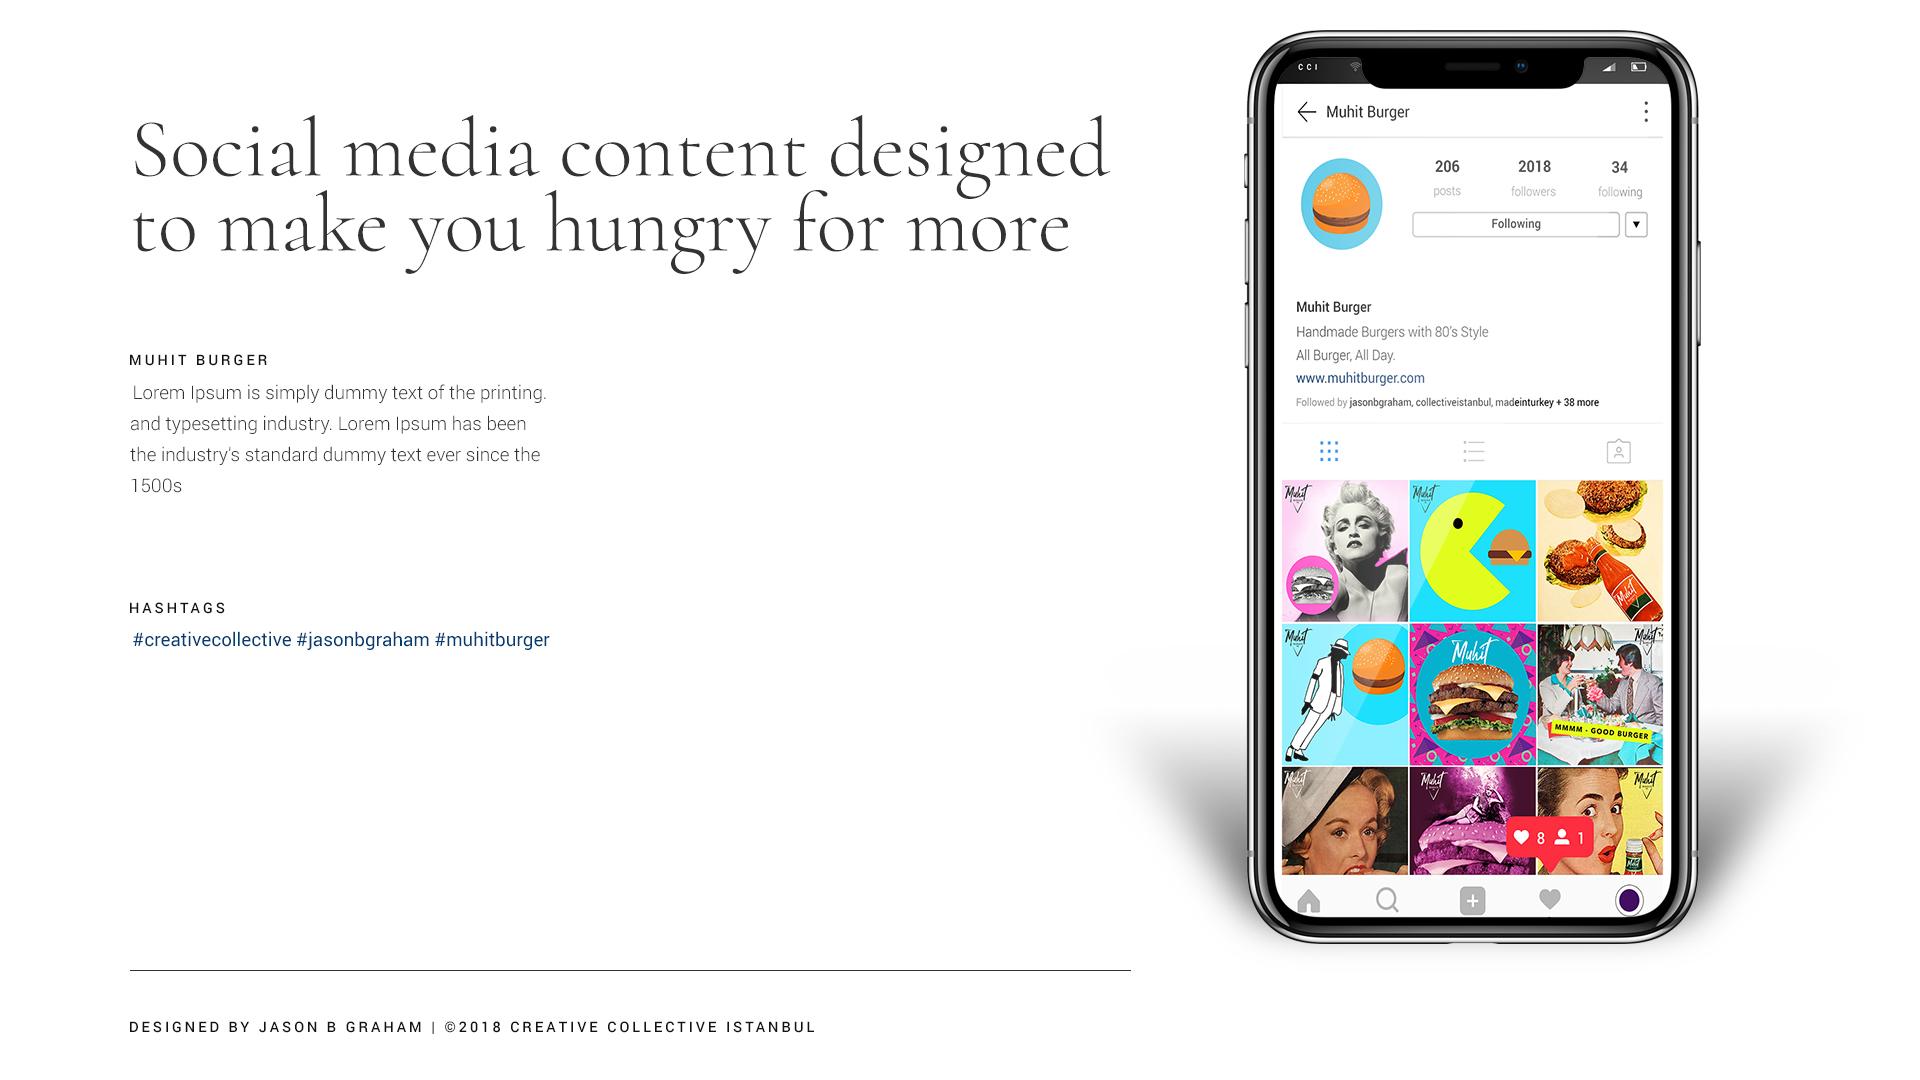 muhit-burger-social-media-campaign